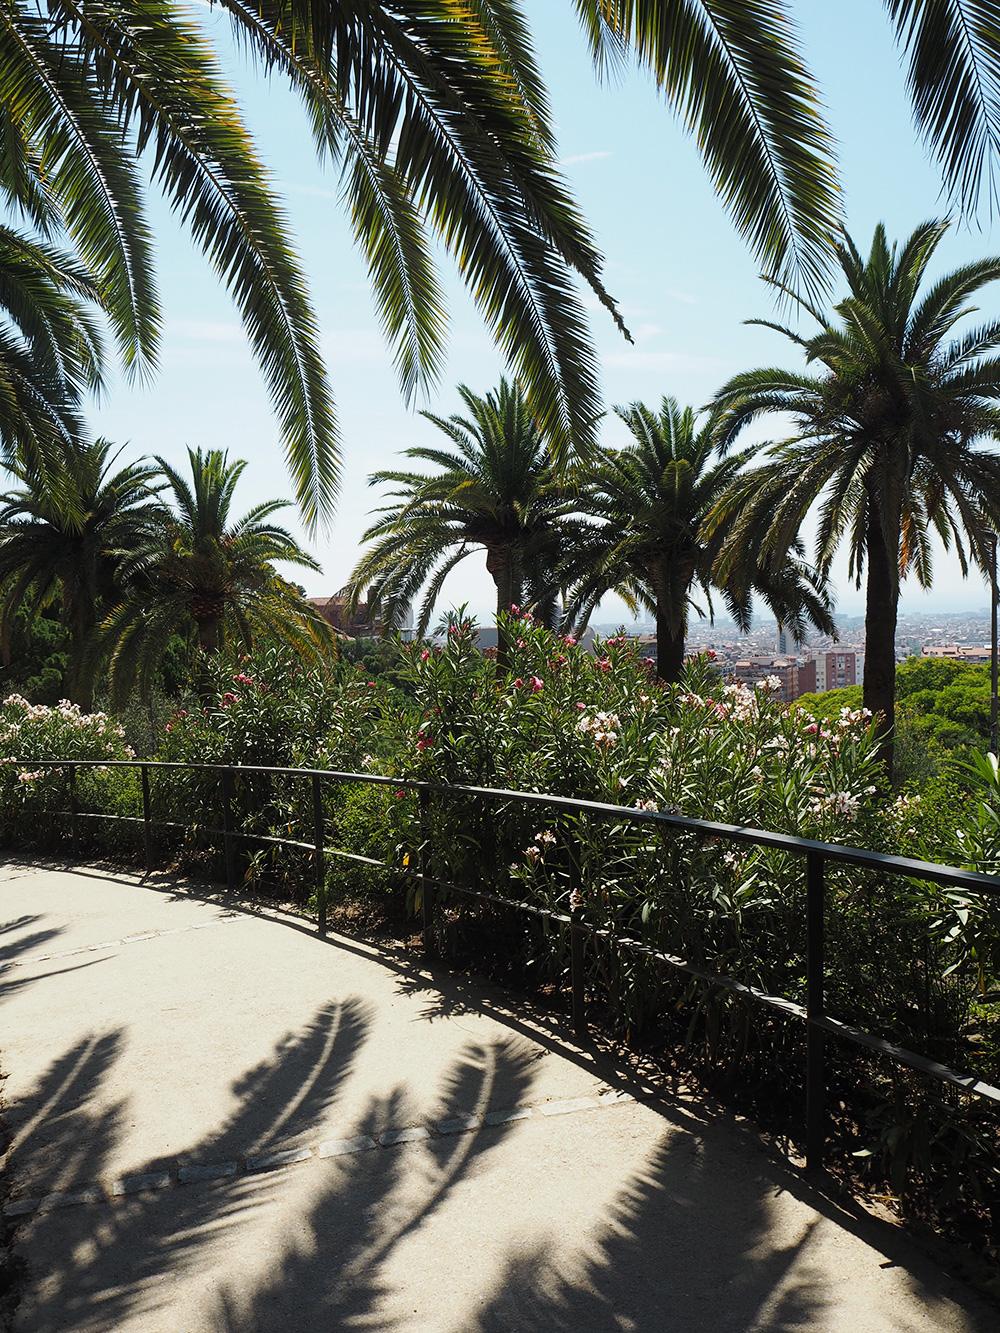 RosyCheeks-Barcelona-palm-trees